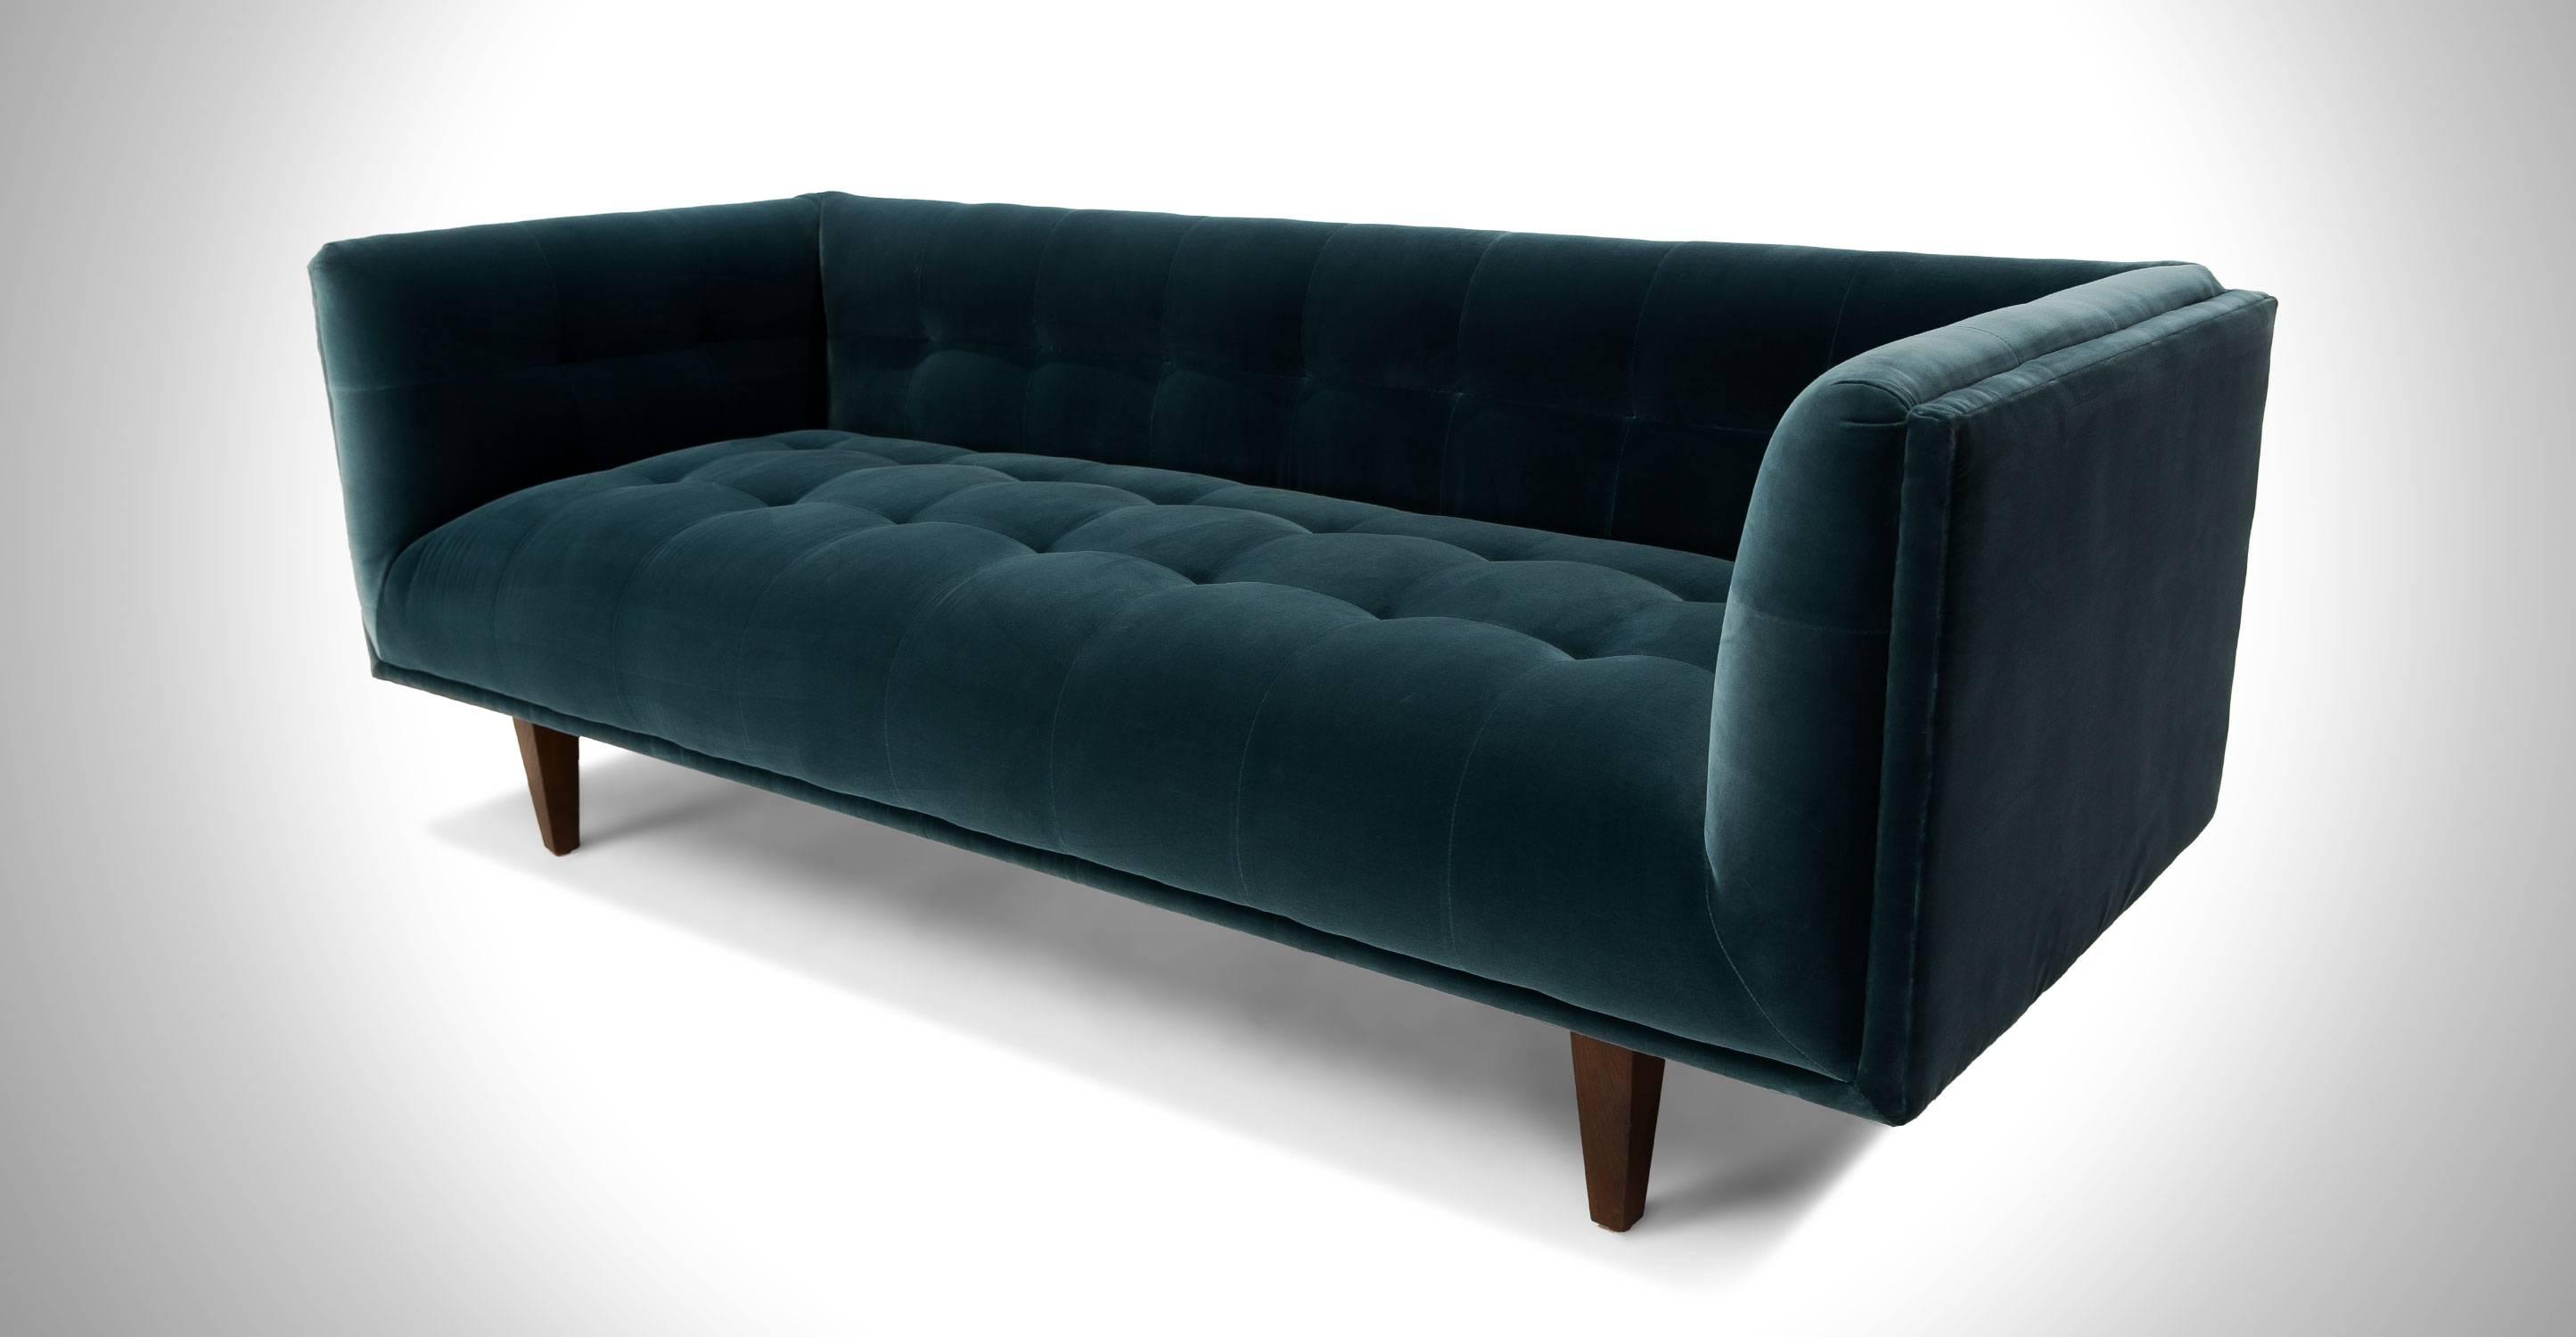 Blue Sofa | Tehranmix Decoration pertaining to Blue Tufted Sofas (Image 5 of 30)